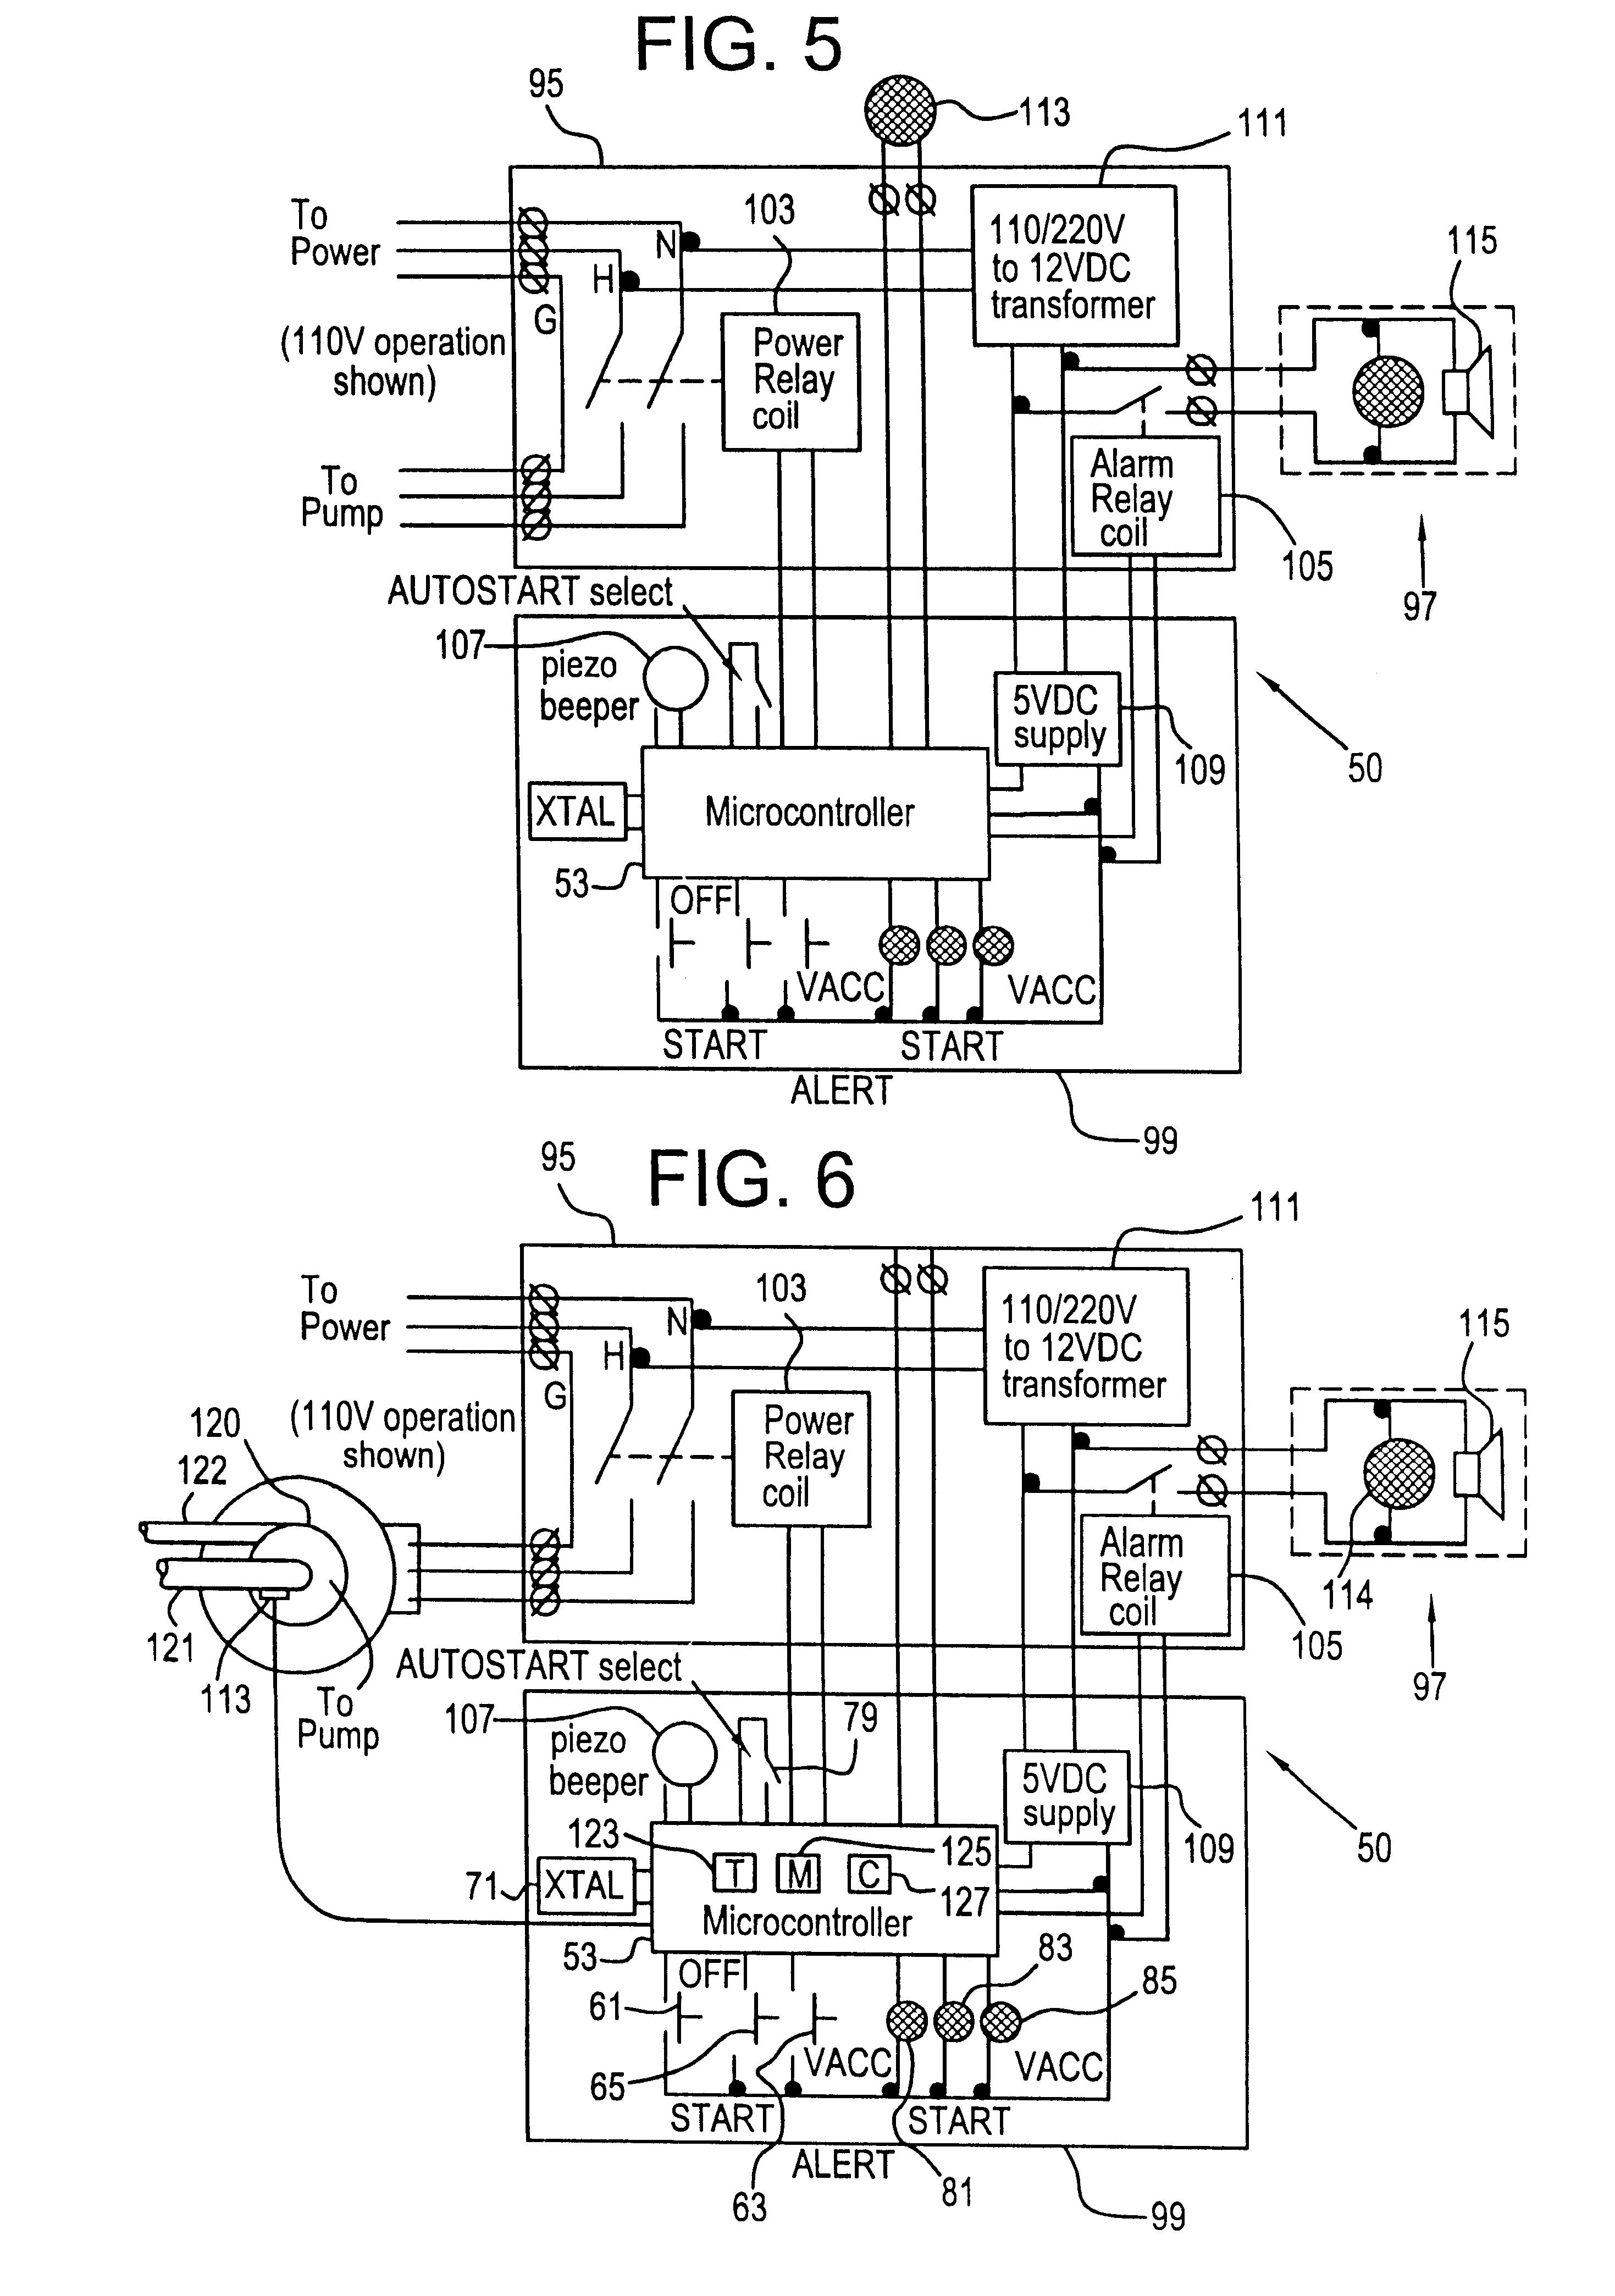 cub cadet wiring diagrams wiring diagrams pollock wiring diagrams pollock wiring diagrams wiring diagram for late triumph ... #7